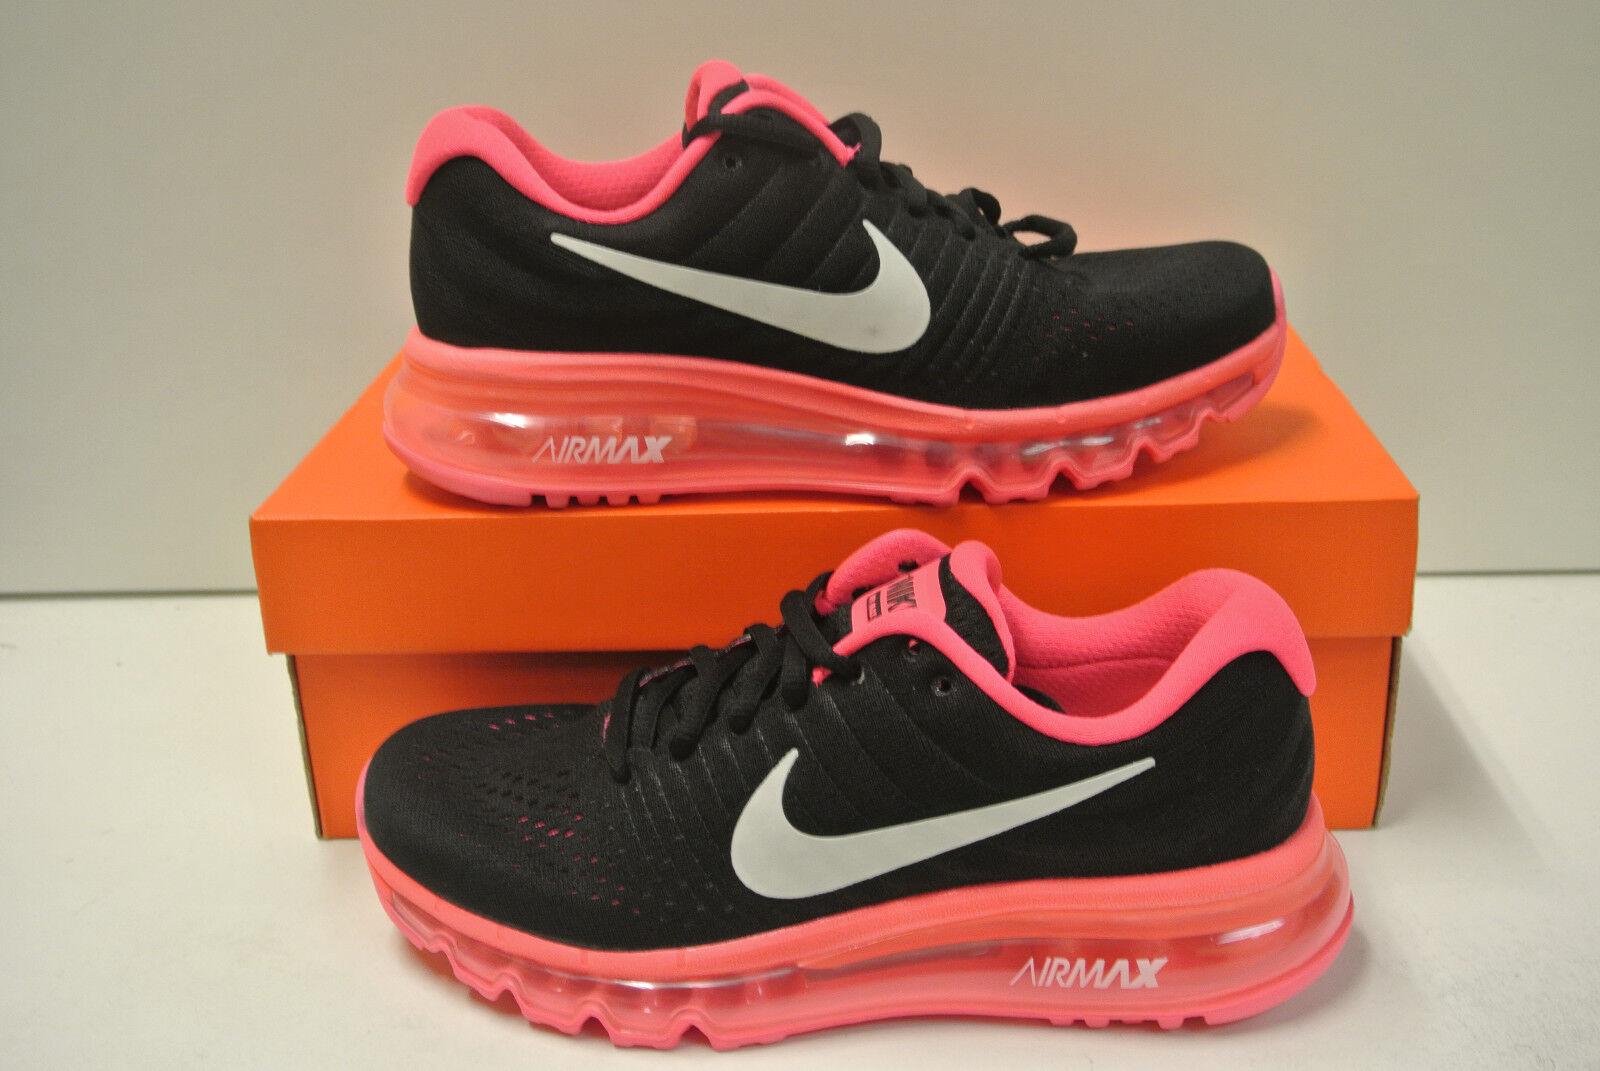 Nike Air Max Max Max 2017 Talla a Elegir Nuevo y Emb. Orig. 851623 001  buena calidad